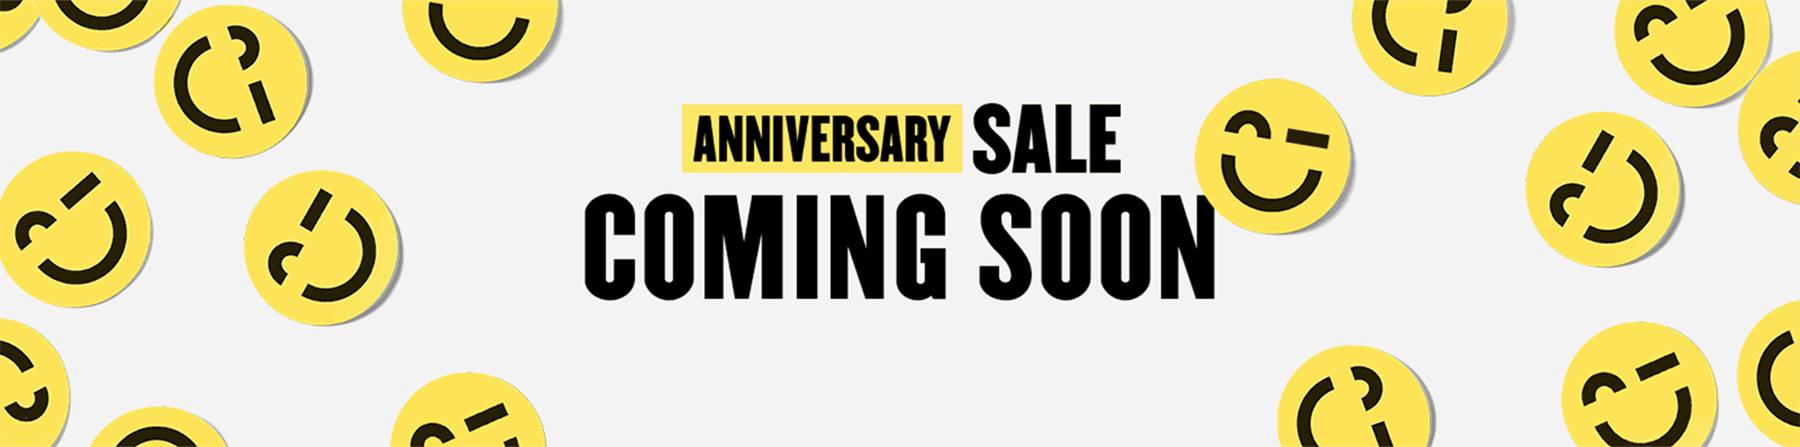 nodstrom anniversary sale 2020 fashion jackson